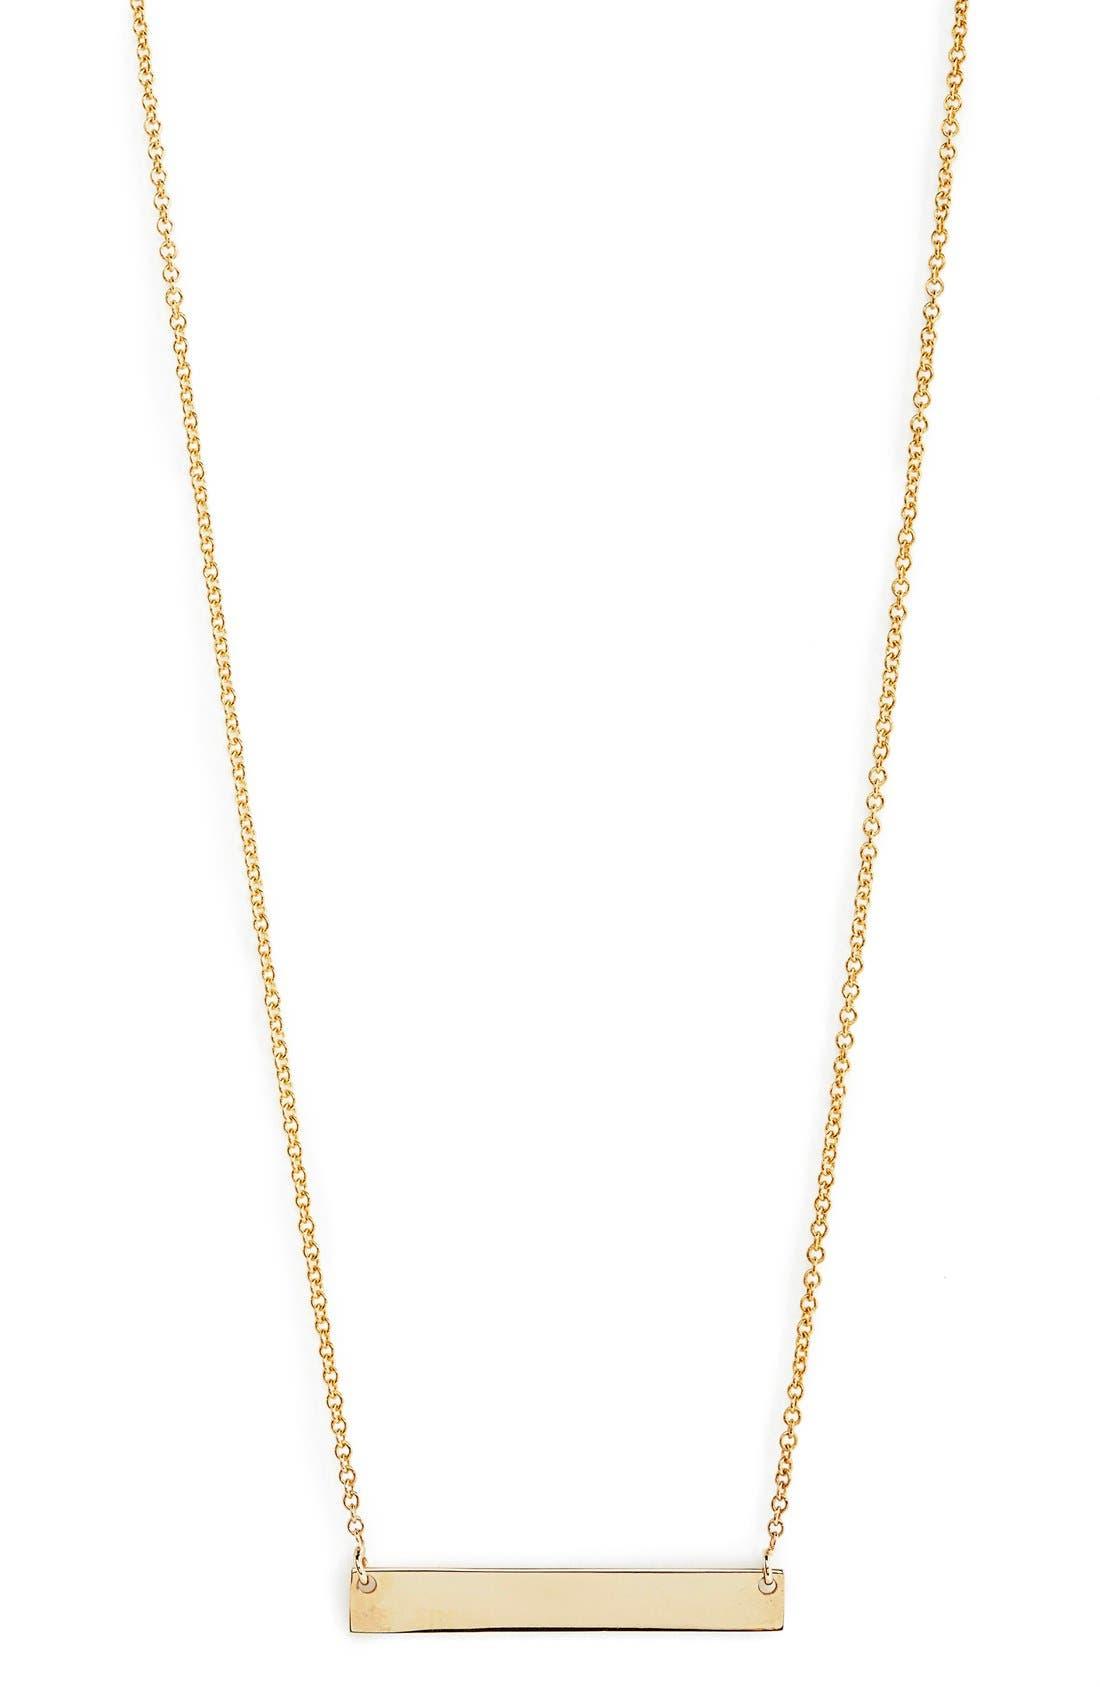 14k GoldBar Pendant Necklace,                         Main,                         color, YELLOW GOLD